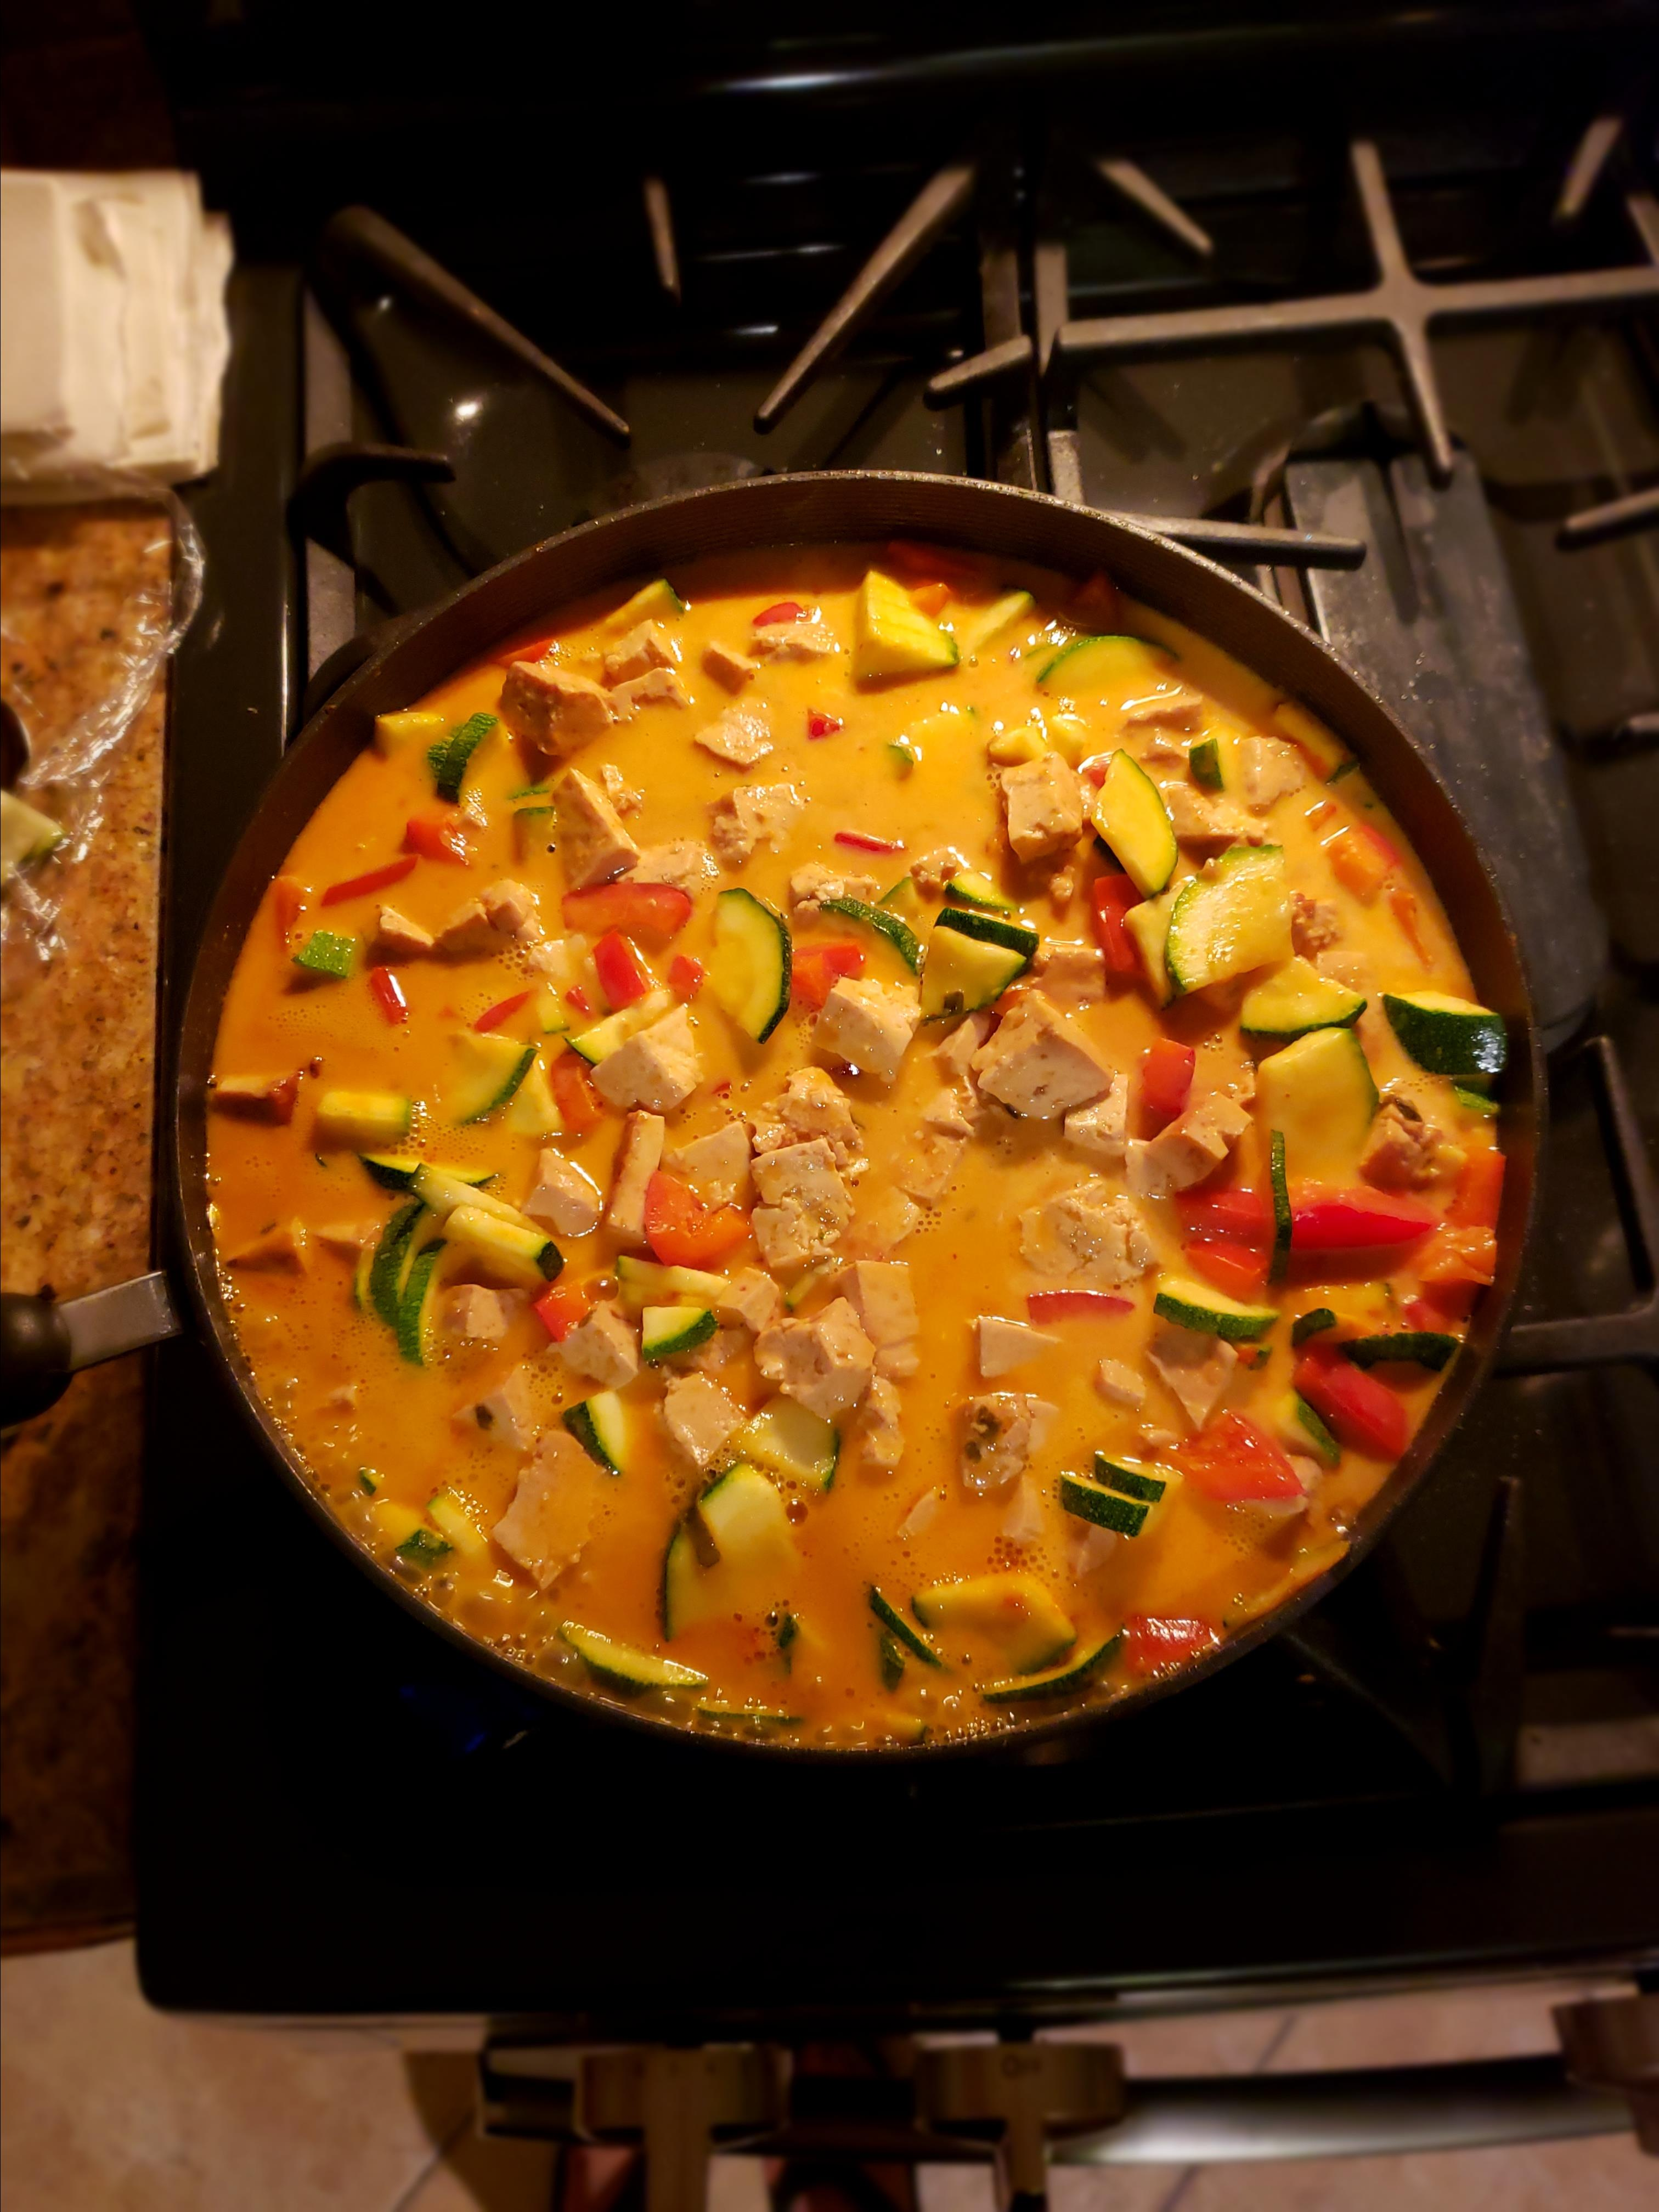 Lime-Curry Tofu Stir-Fry